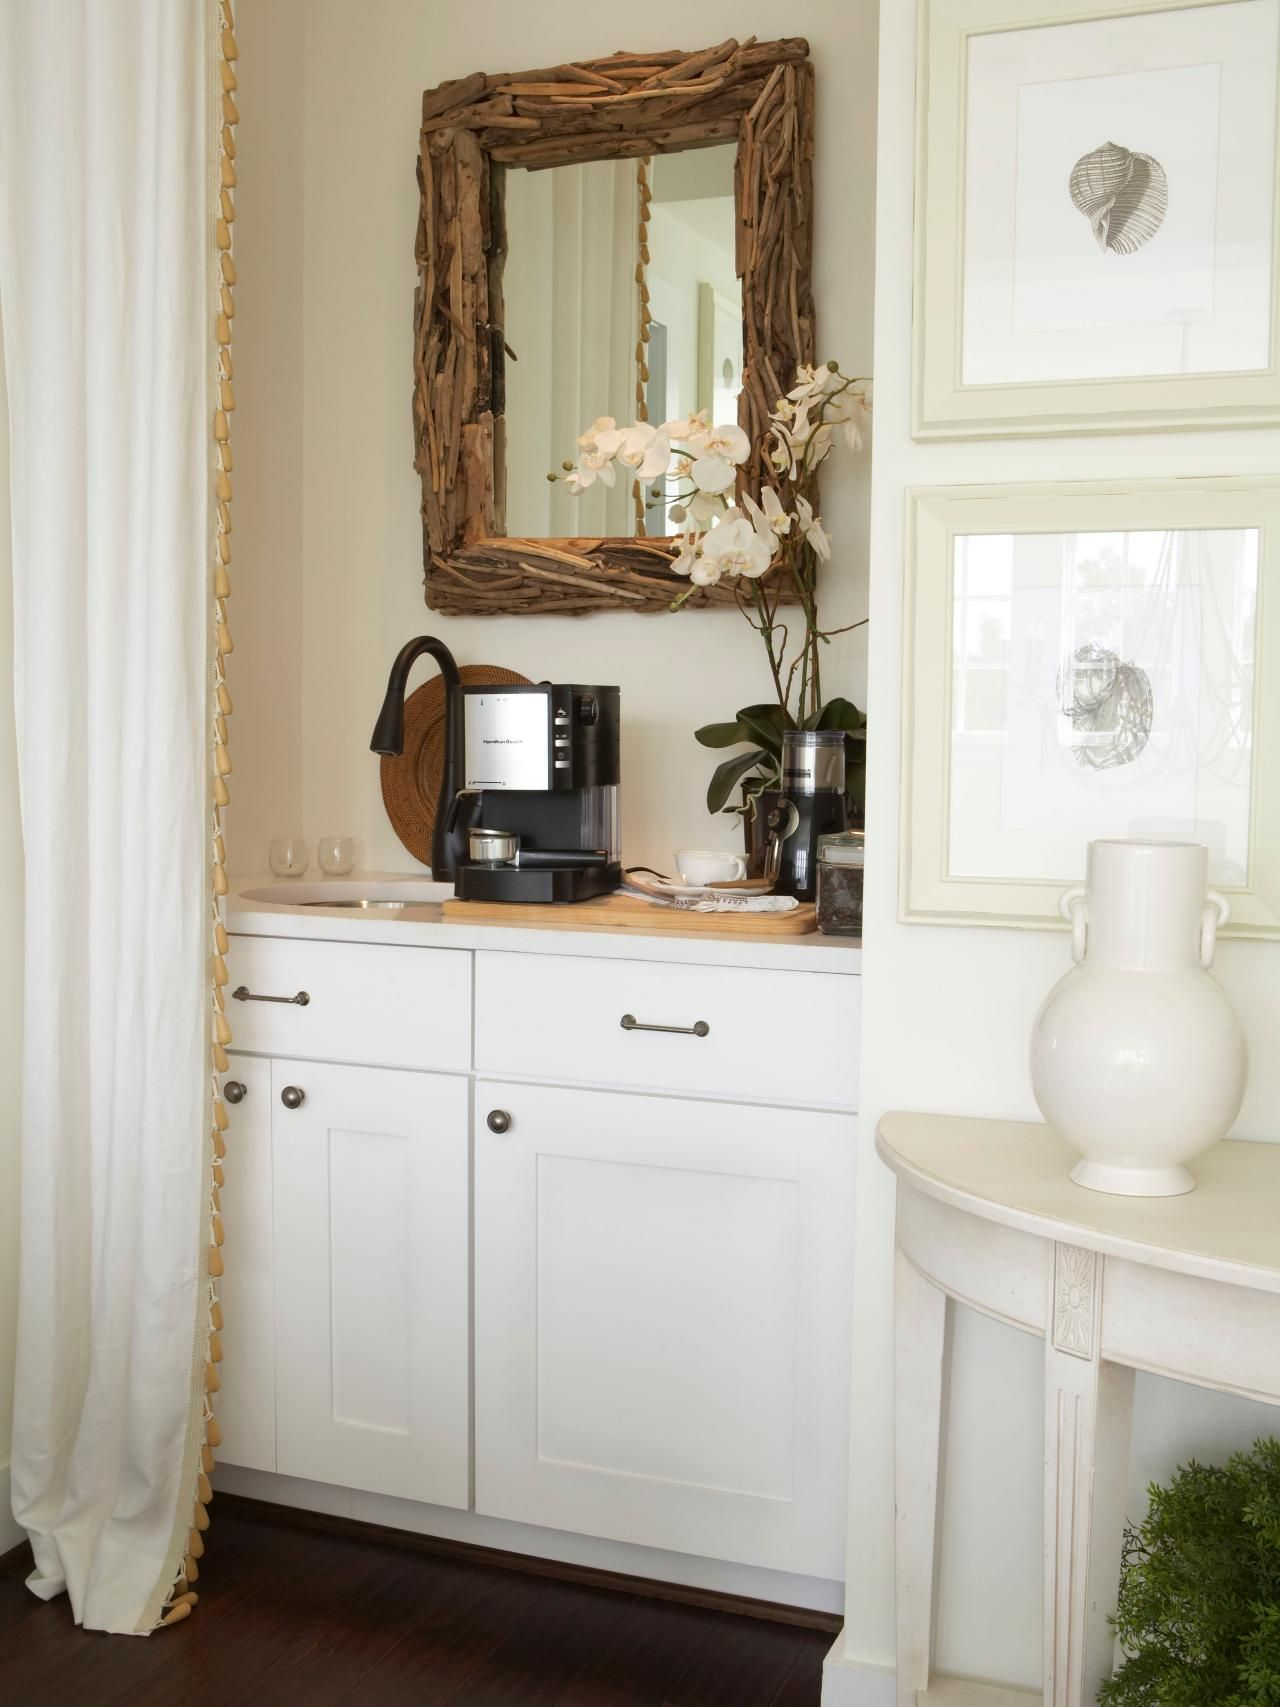 Wood Furniture Storage | Medicine cabinets, Wood furniture and Bar ...